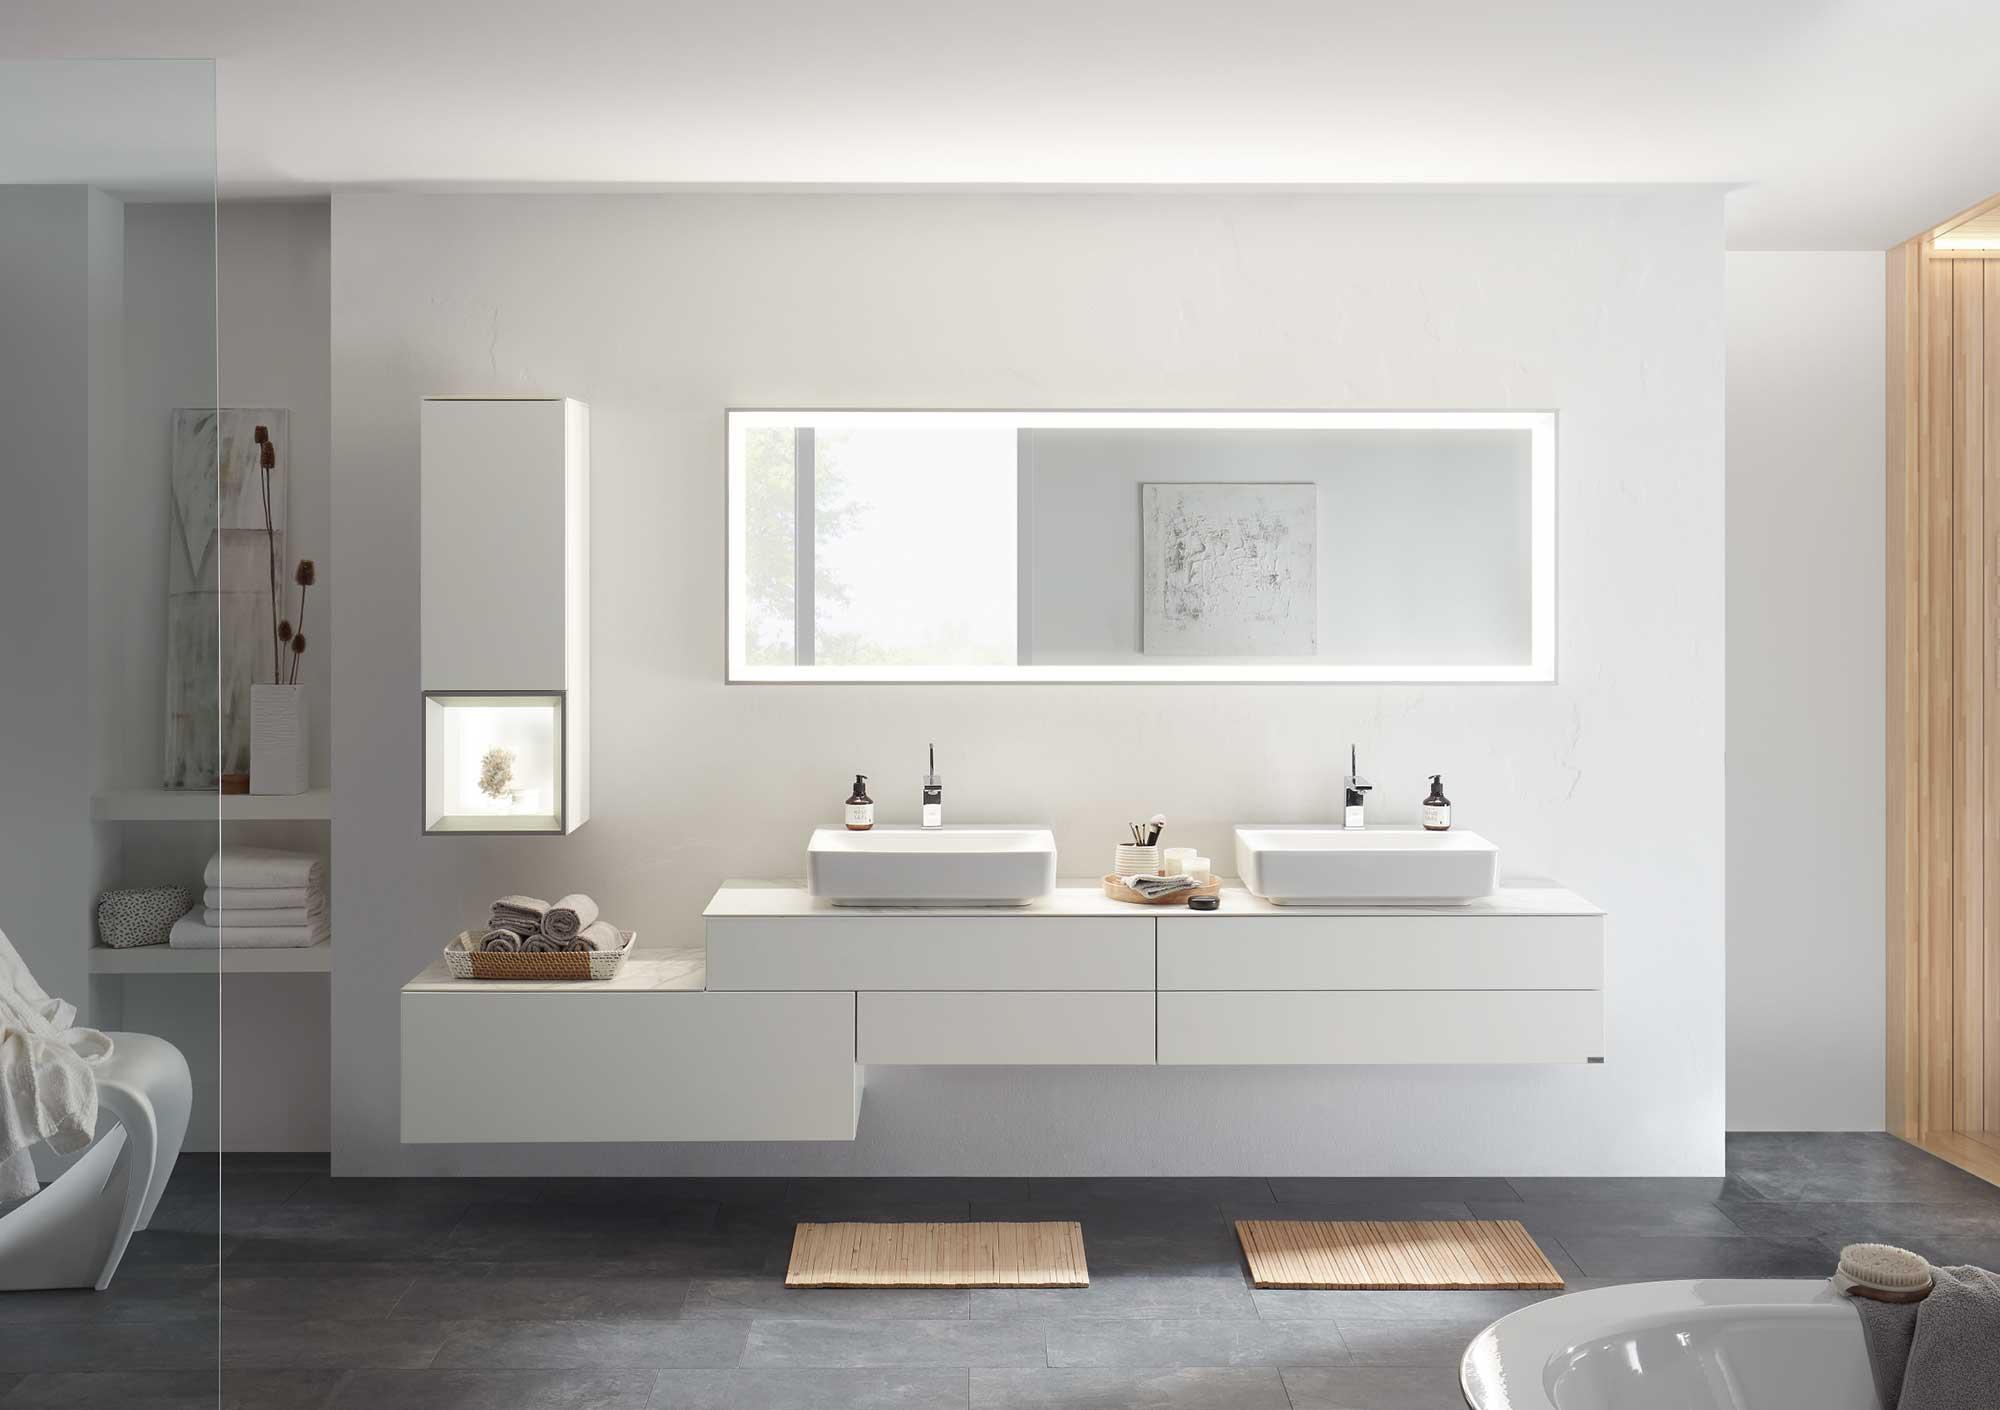 TETRIM – Bathroom design B large